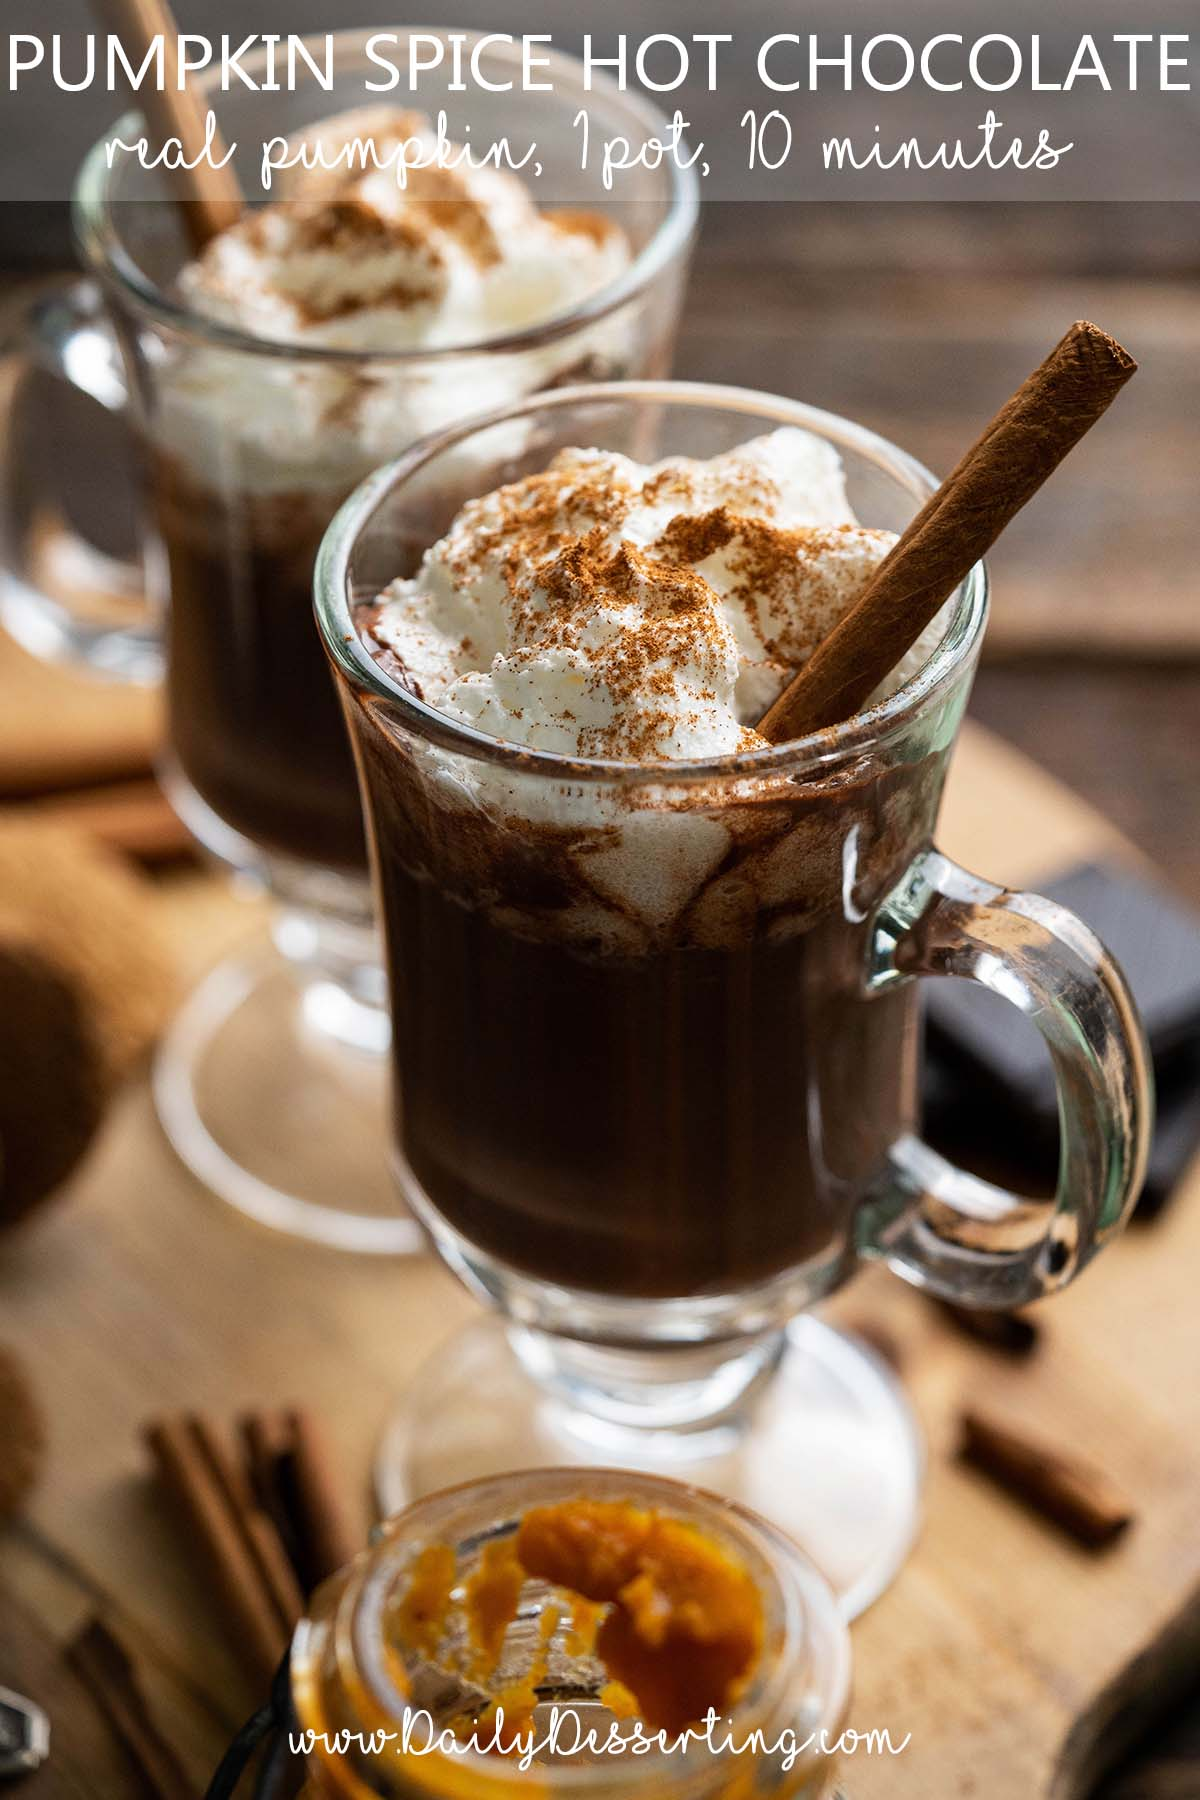 pumpkin spice hot chocolate graphic